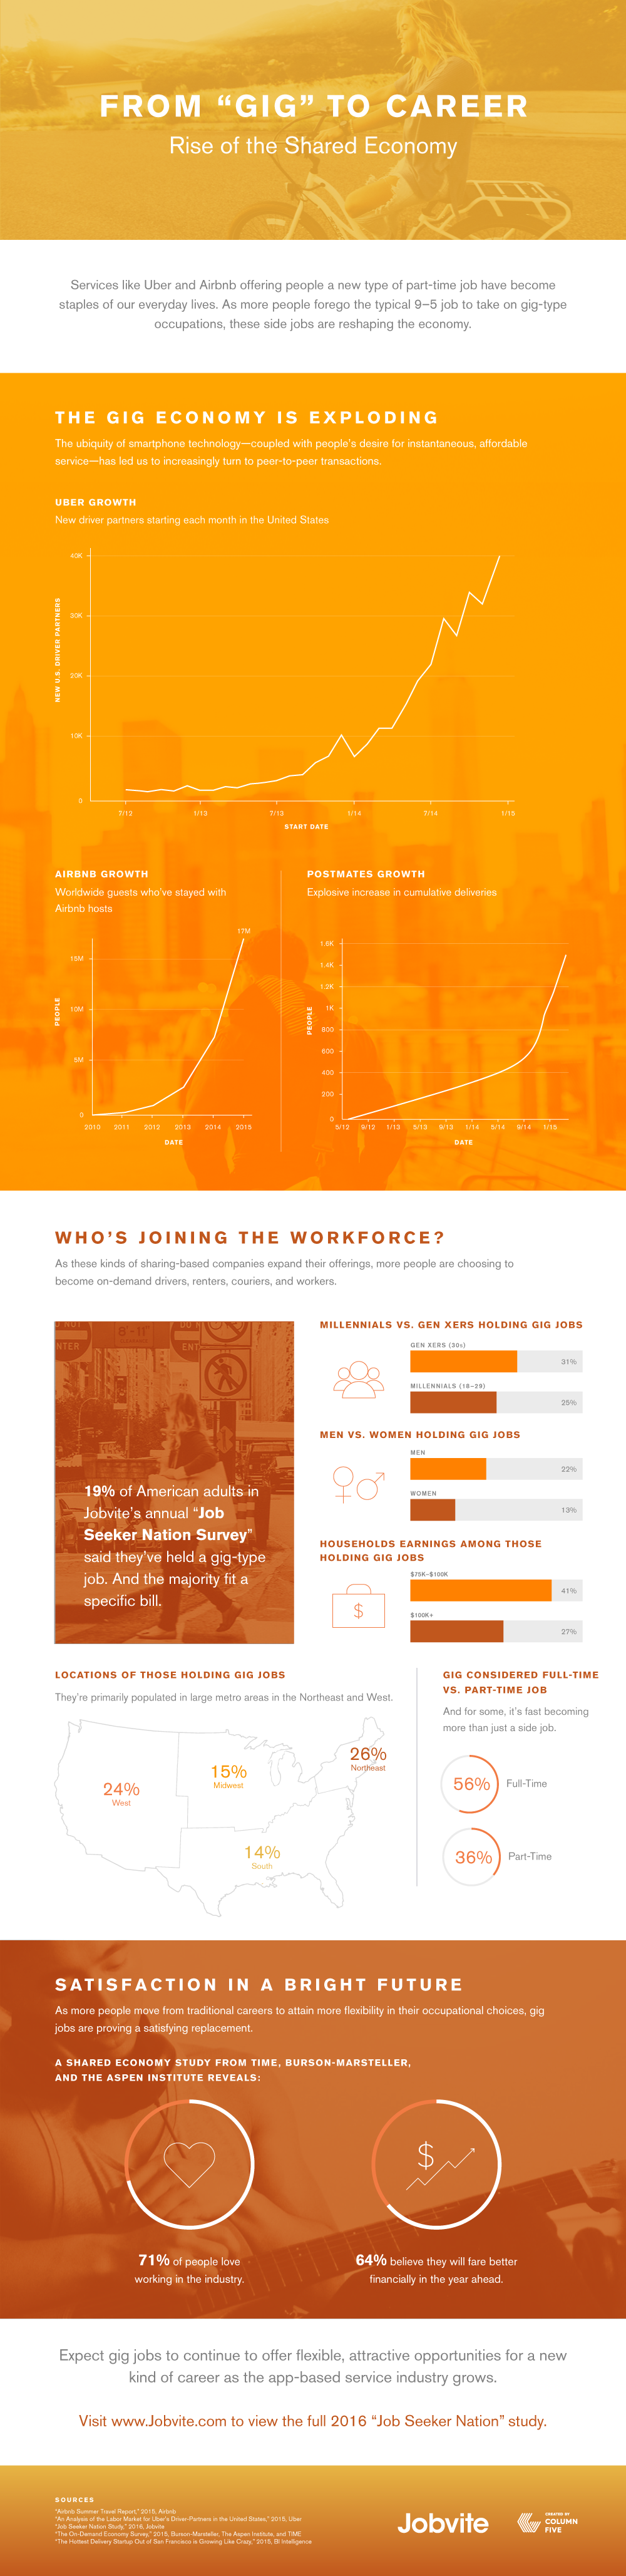 Jobvite Infographic